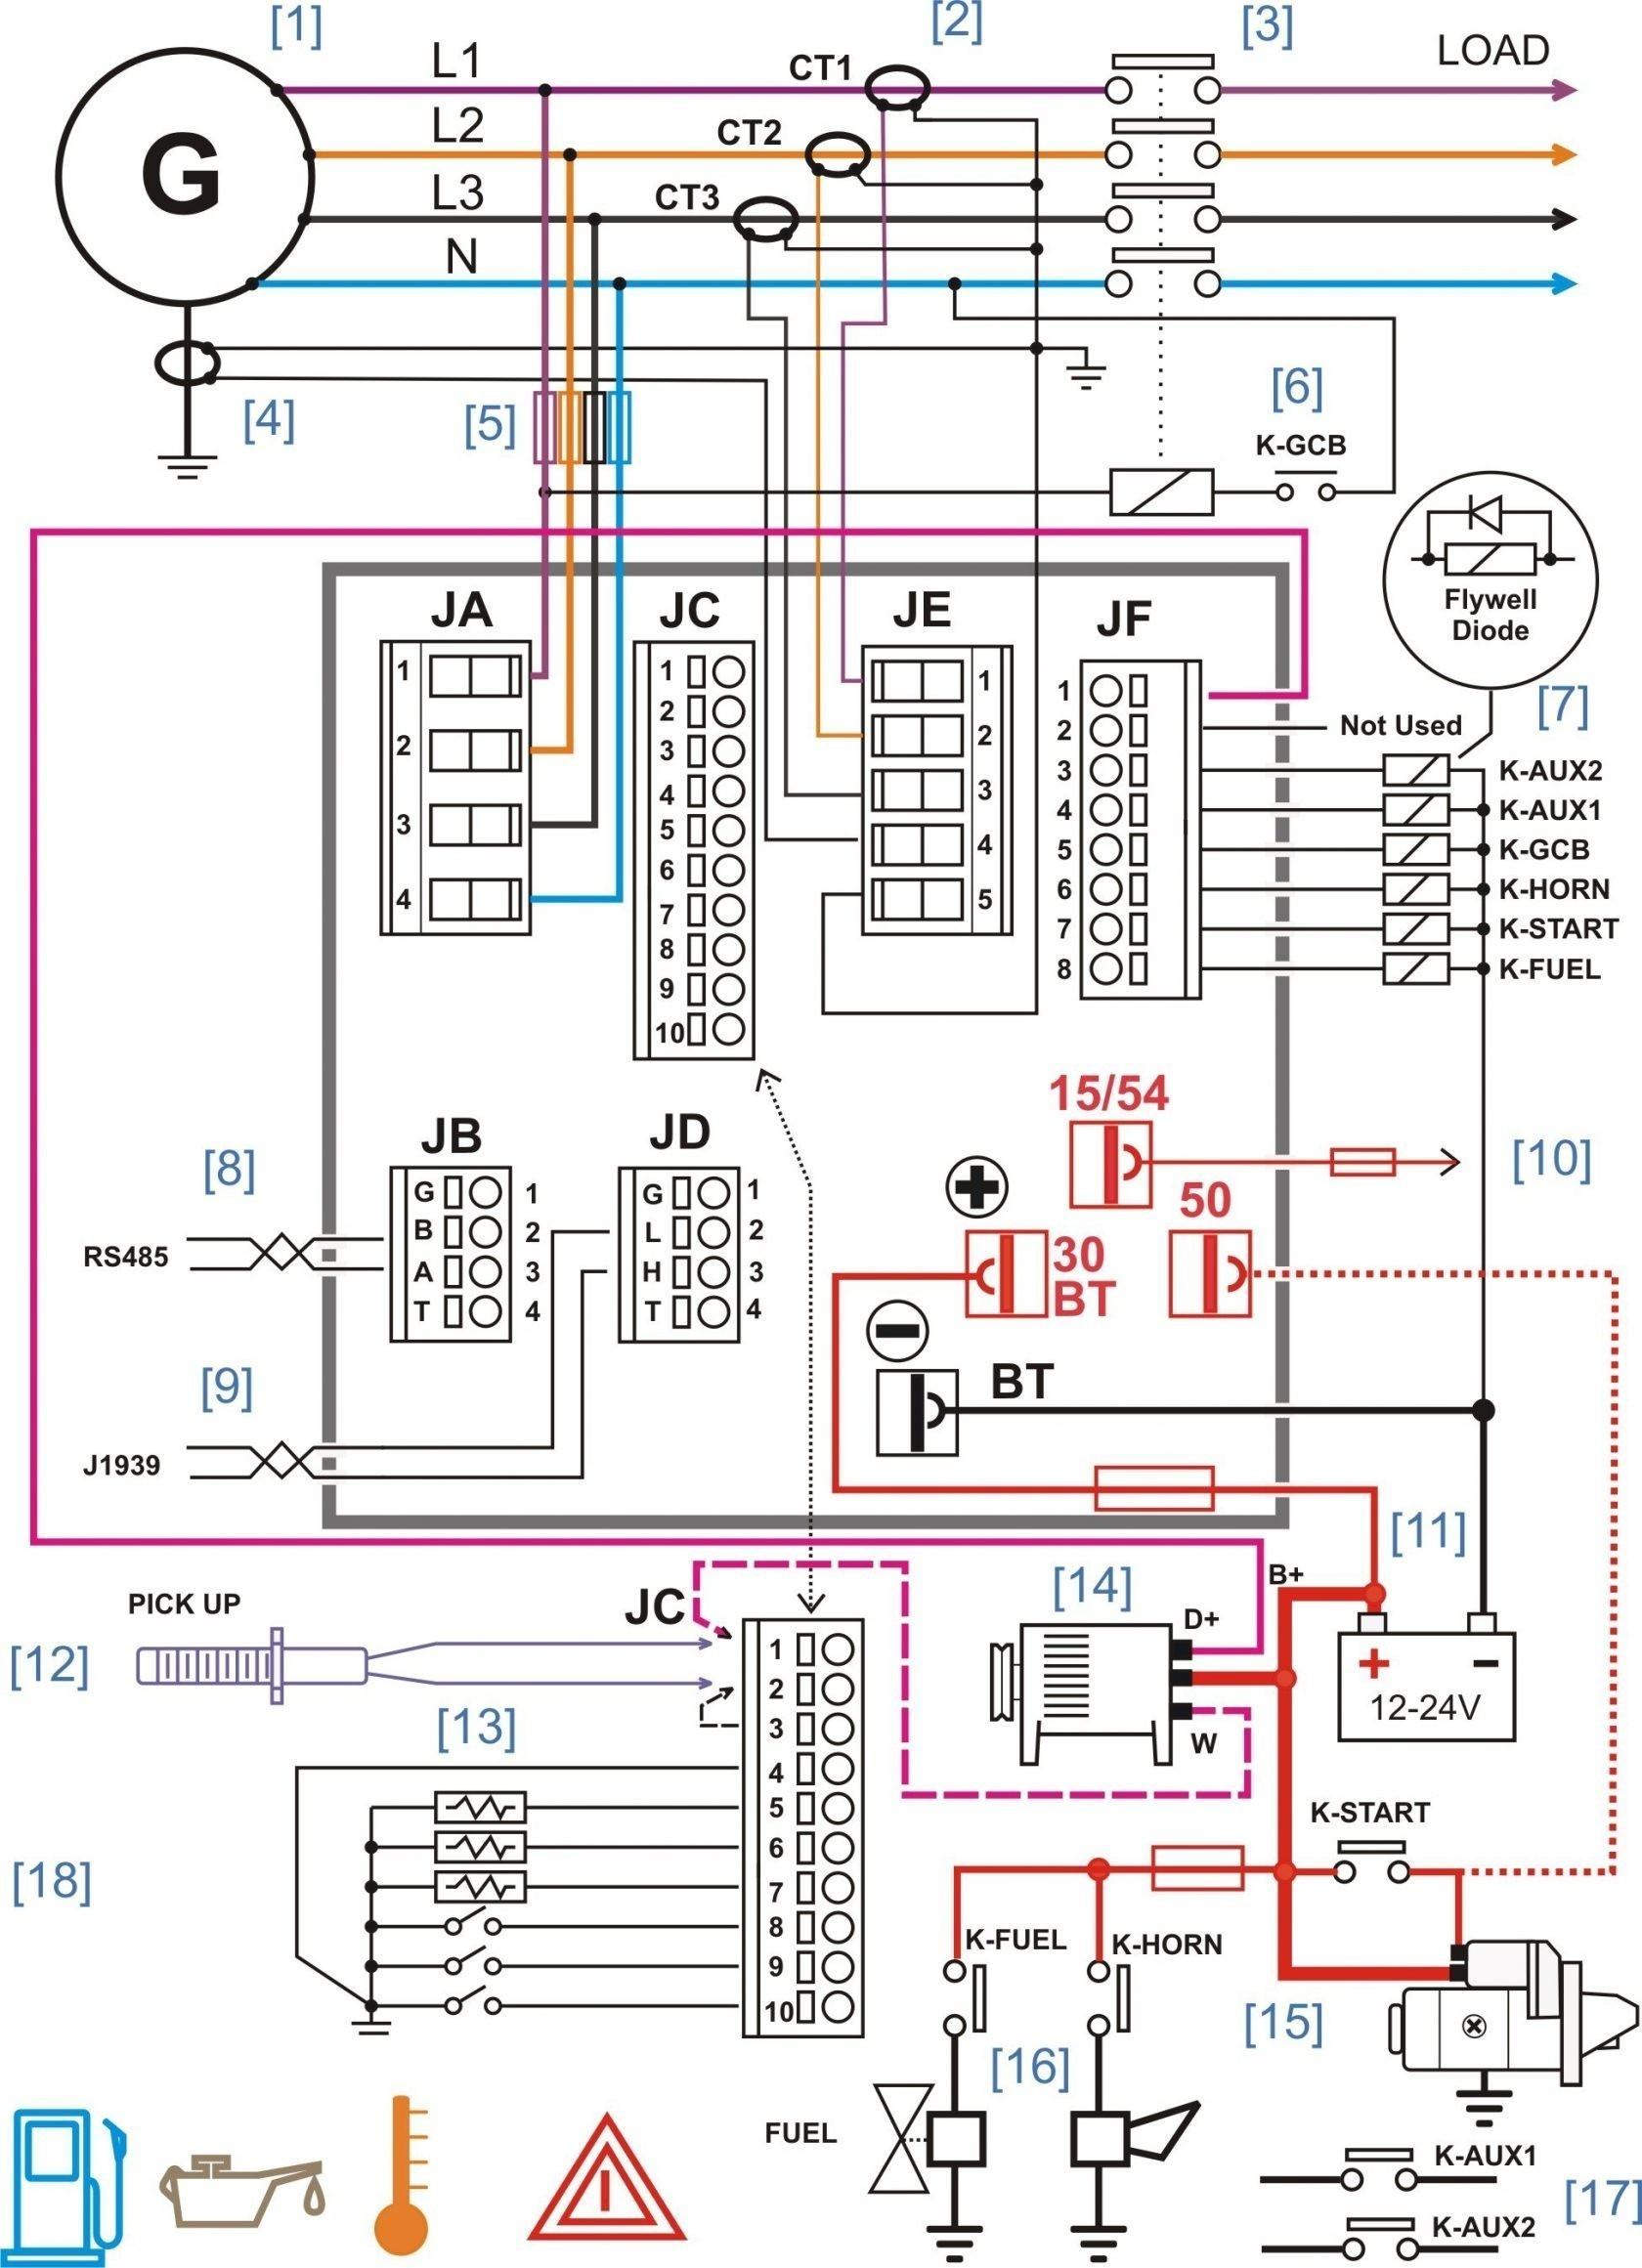 Free Car Wiring Diagrams Rv Park Wiring Diagram Of Free Car Wiring Diagrams